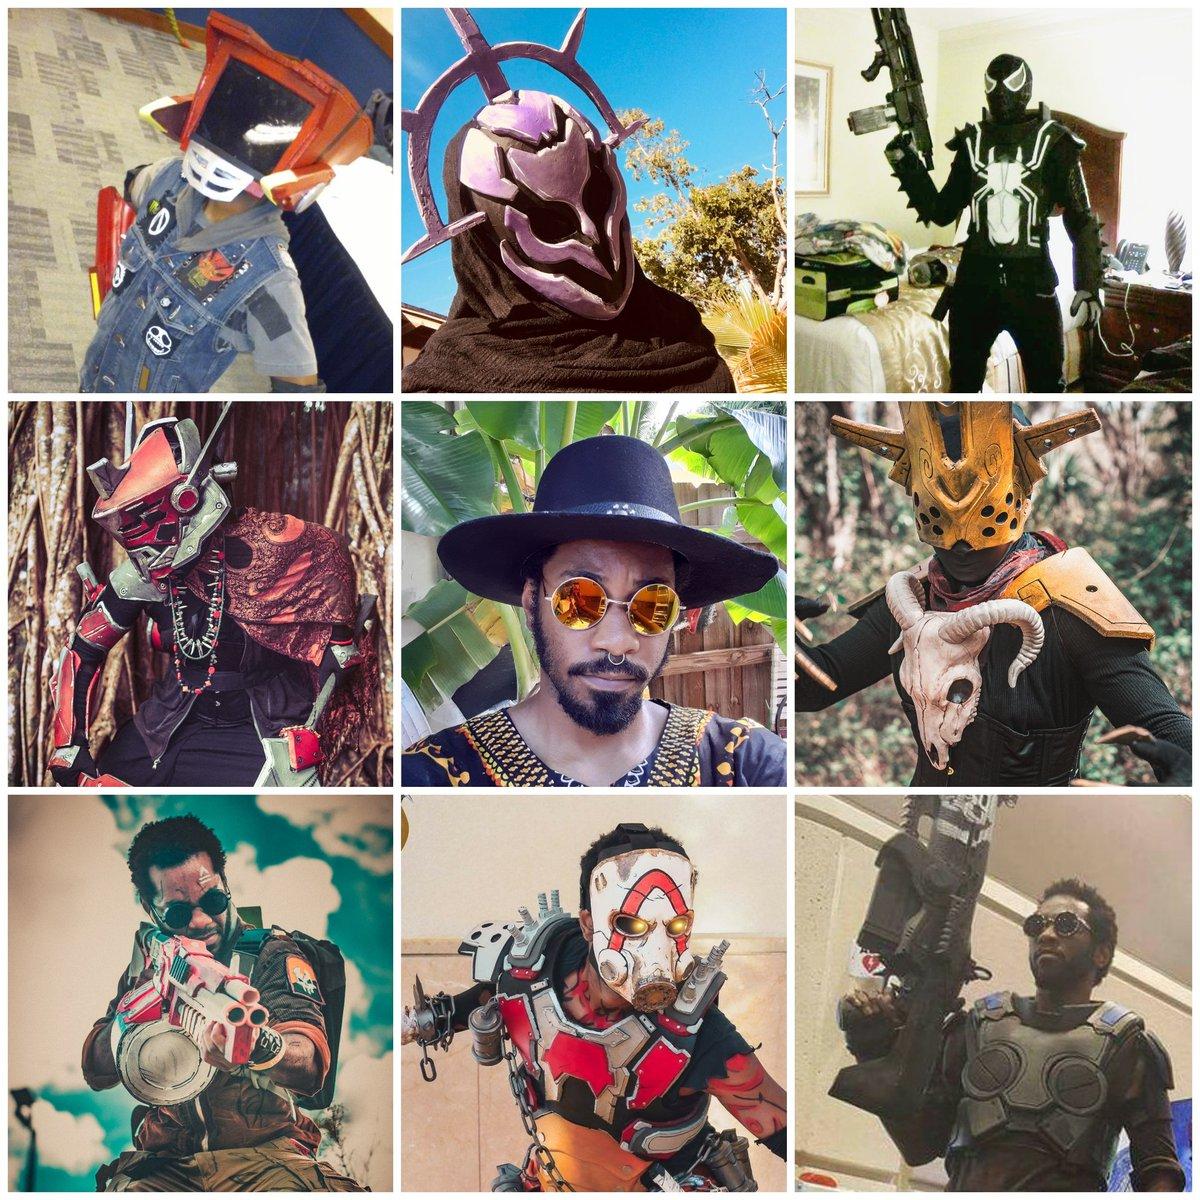 15 years of being creative & 6 years of making Cosplays  #FLCL #SpiderMan #SciFi #Borderlands #GearsOfWar #PropMaker #EvaFoam #faceyourcosplay  #faceyourcospalychallengepic.twitter.com/tSfZM8qKAF